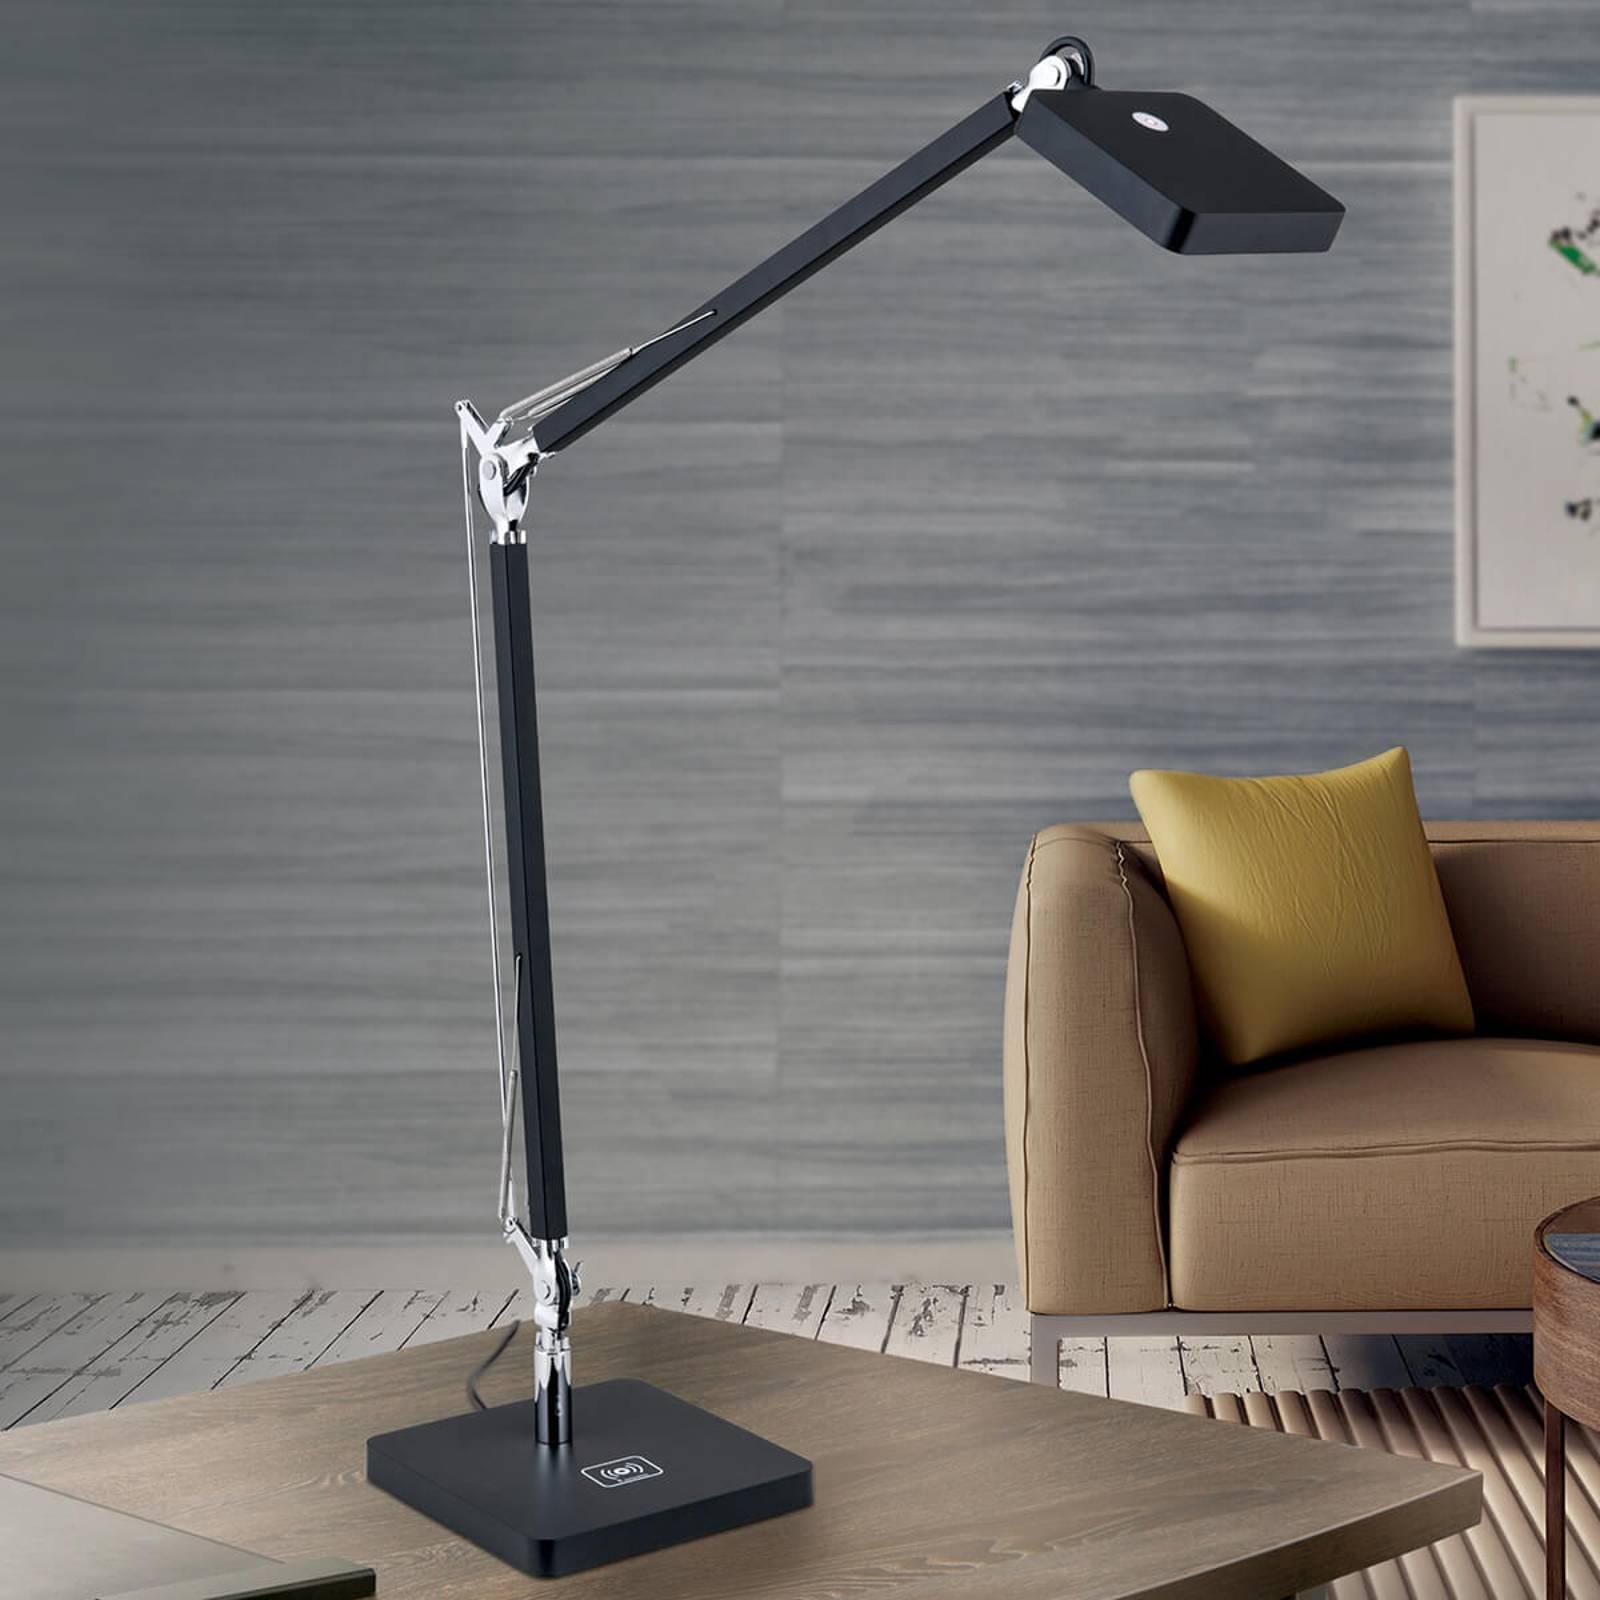 LED bureaulamp Dave met QI laadmodule